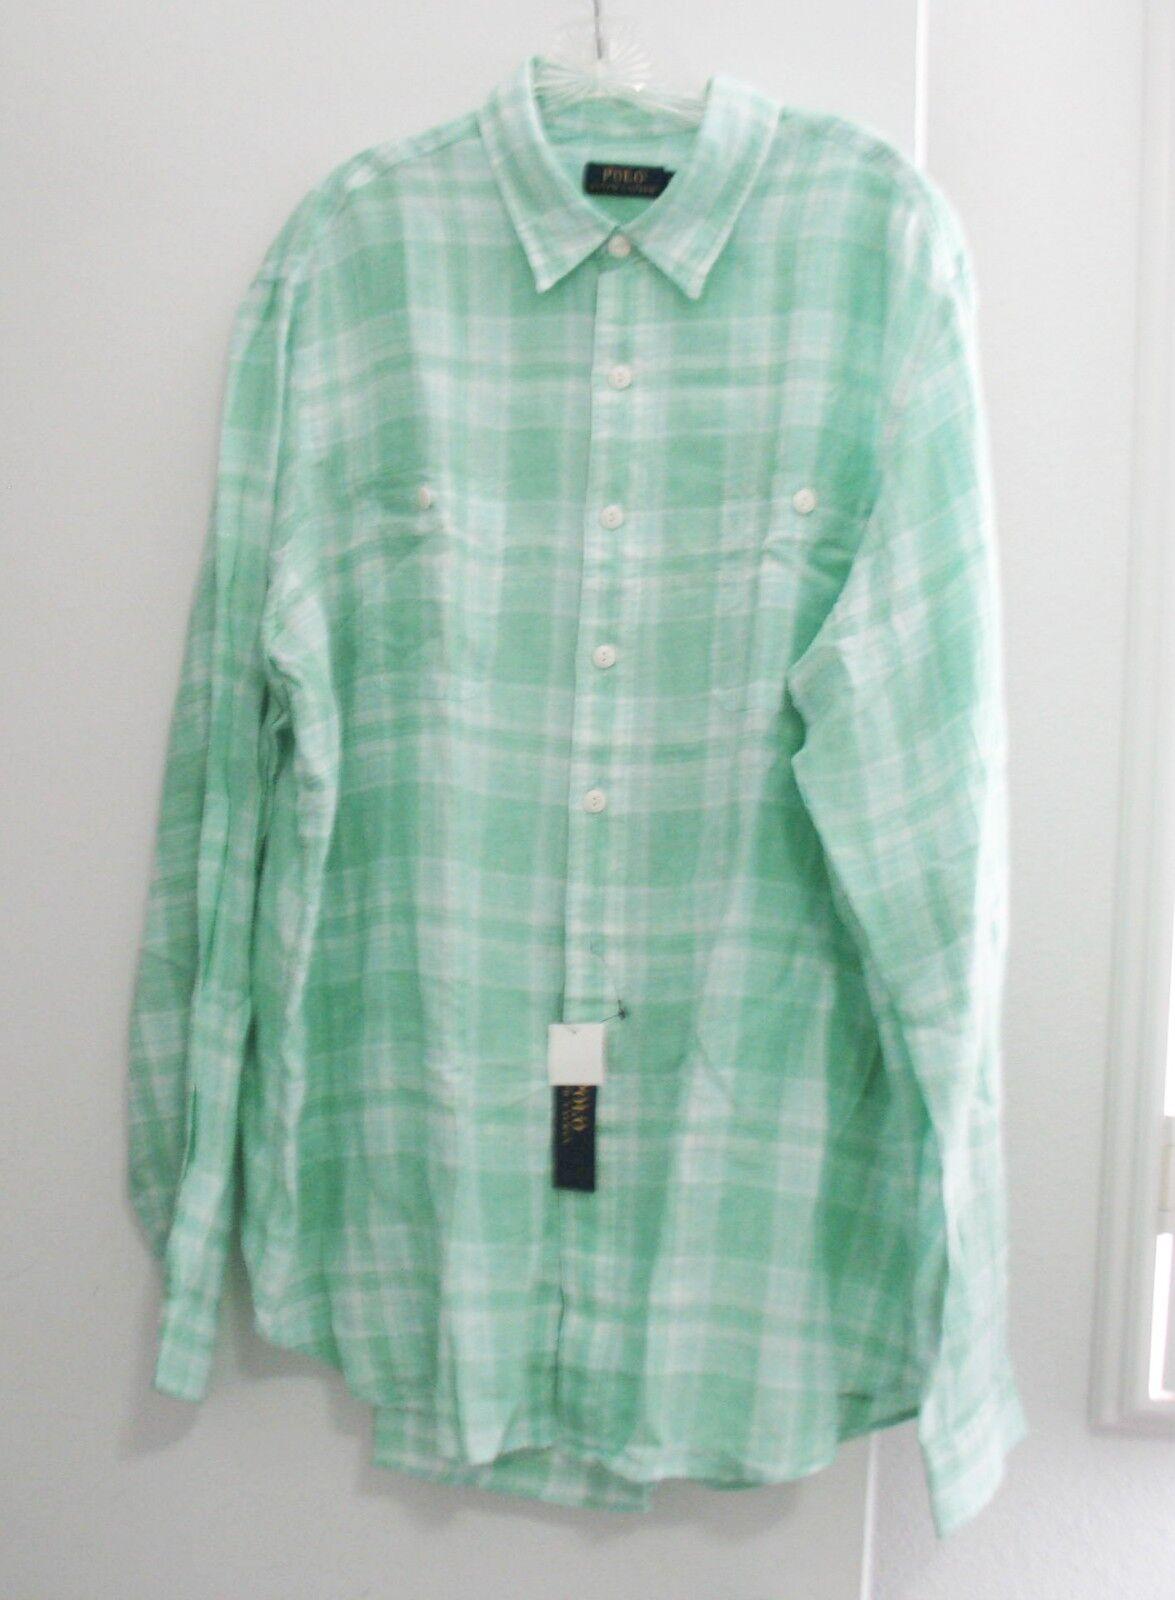 Polo Ralph Lauren Mens Plaid Linen Long Sleeve Workshirt White Green  Sz L - NWT